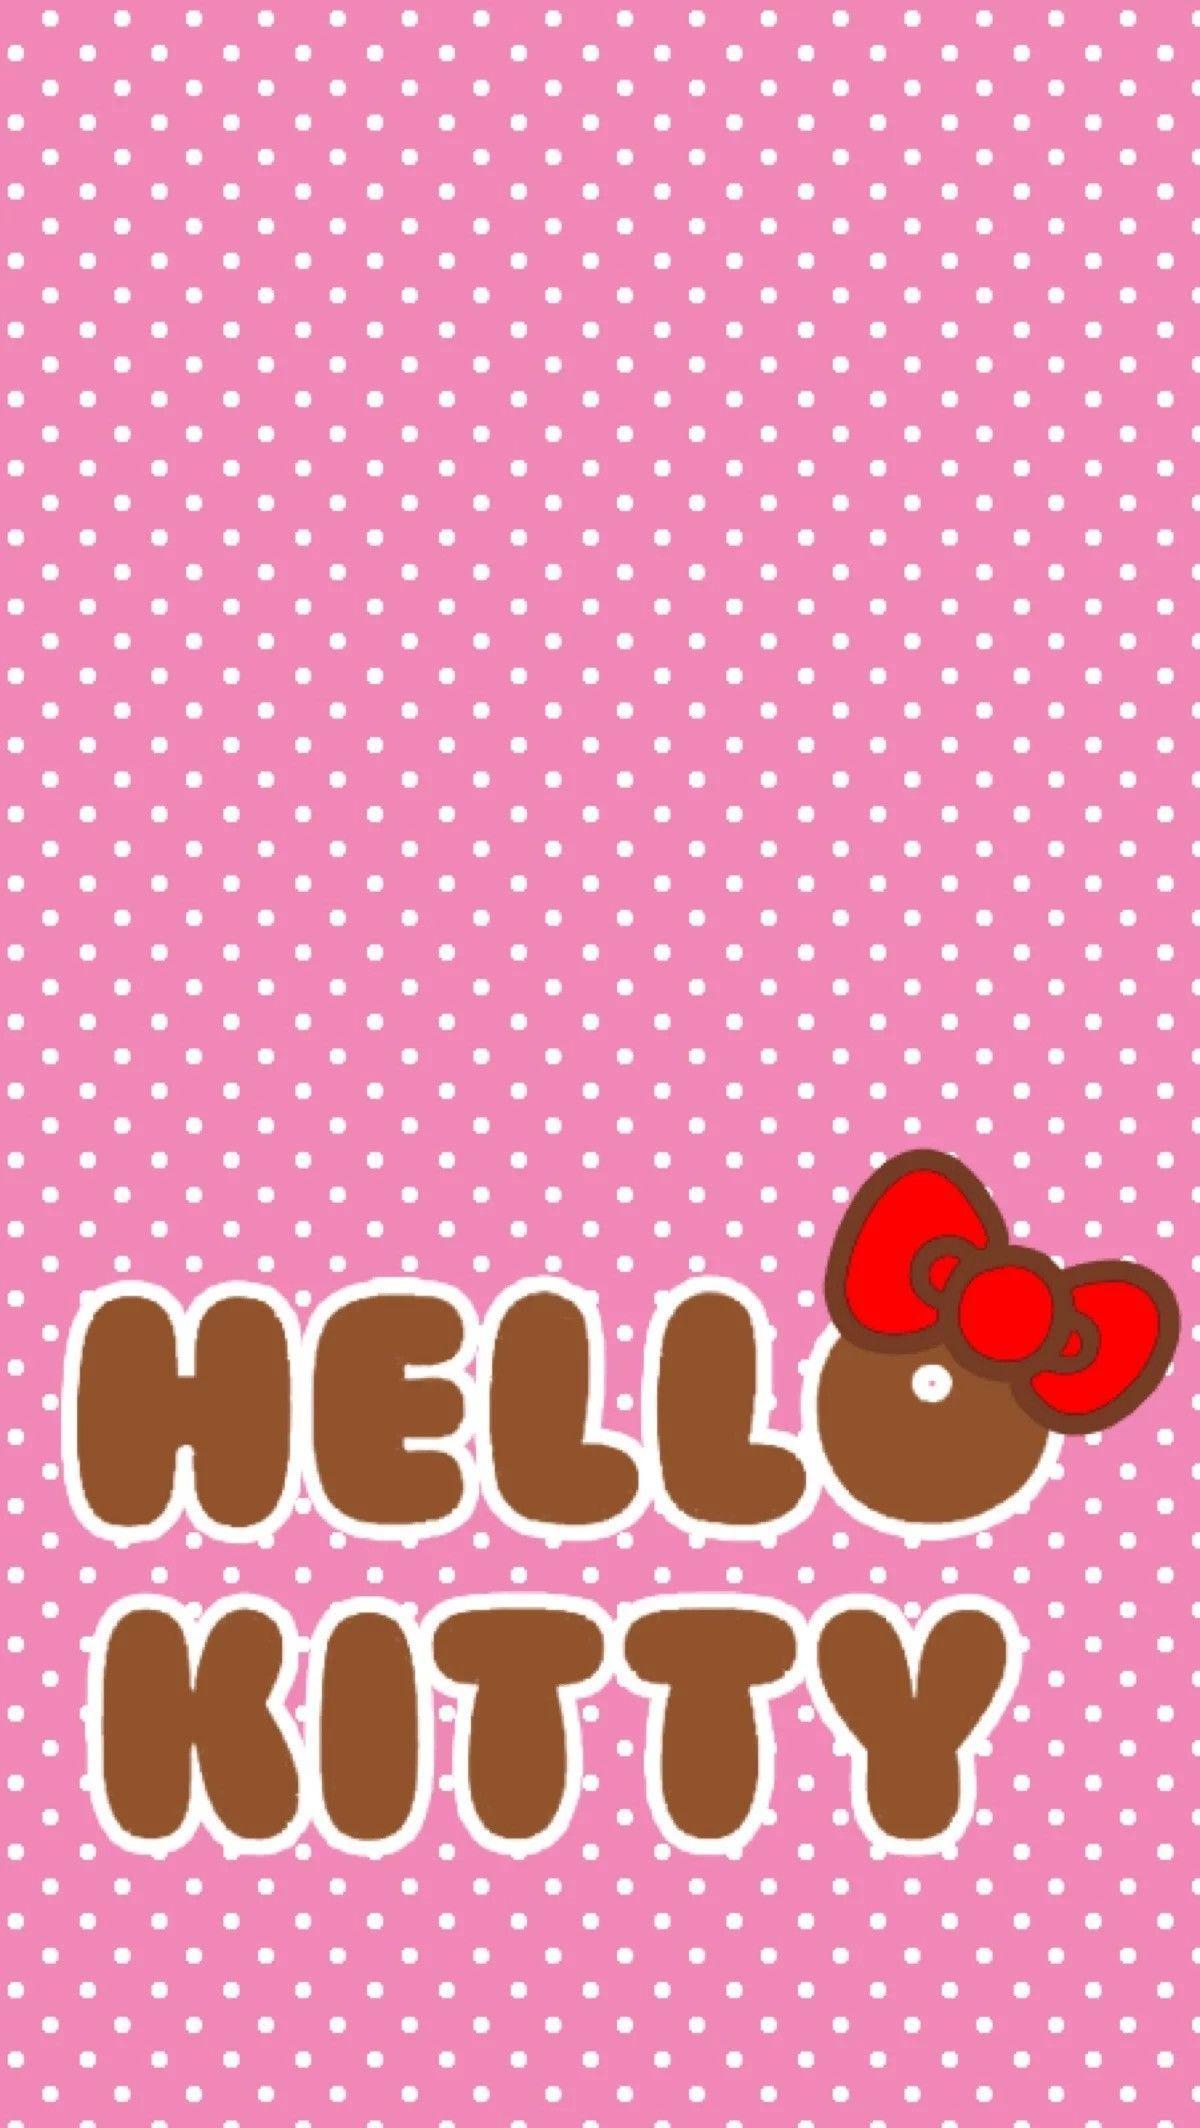 Kawaii Hello Kitty Wallpapers Top Free Kawaii Hello Kitty